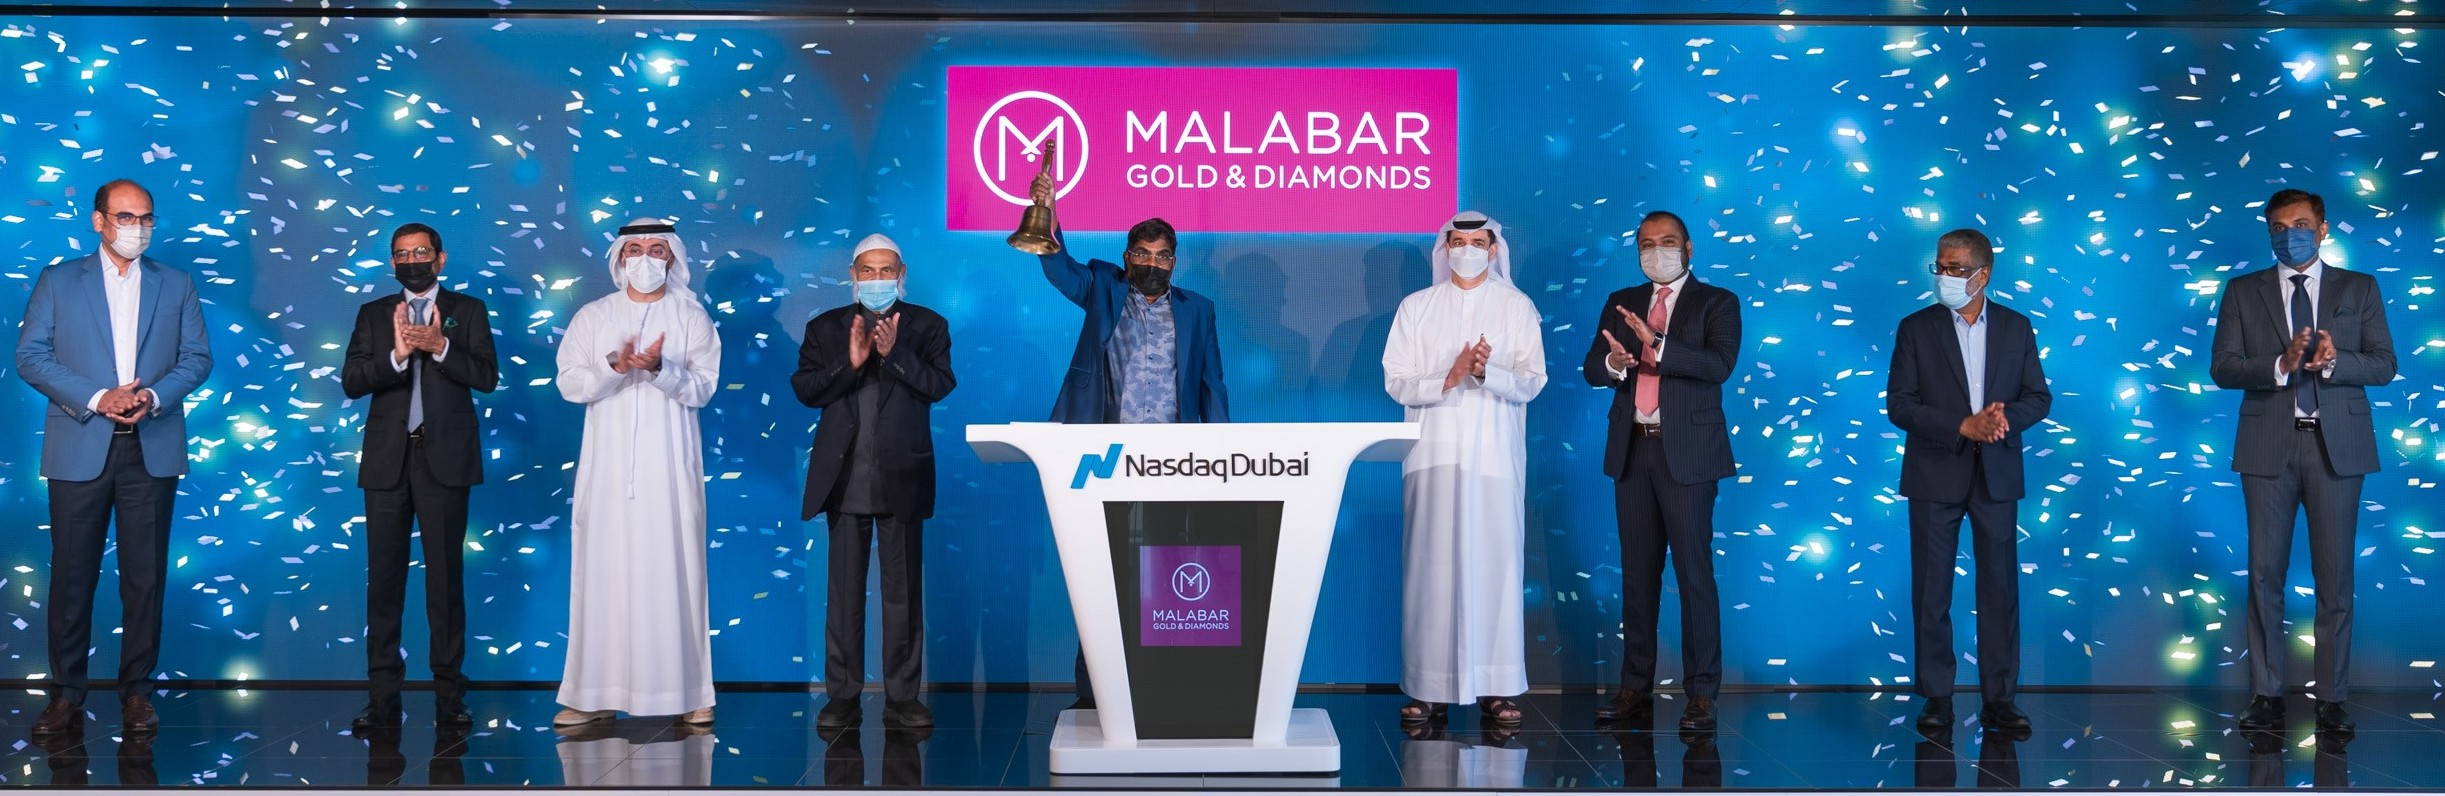 Malabar Gold & Diamonds Redomiciles to DIFC and Joins Nasdaq Dubai's Private Market